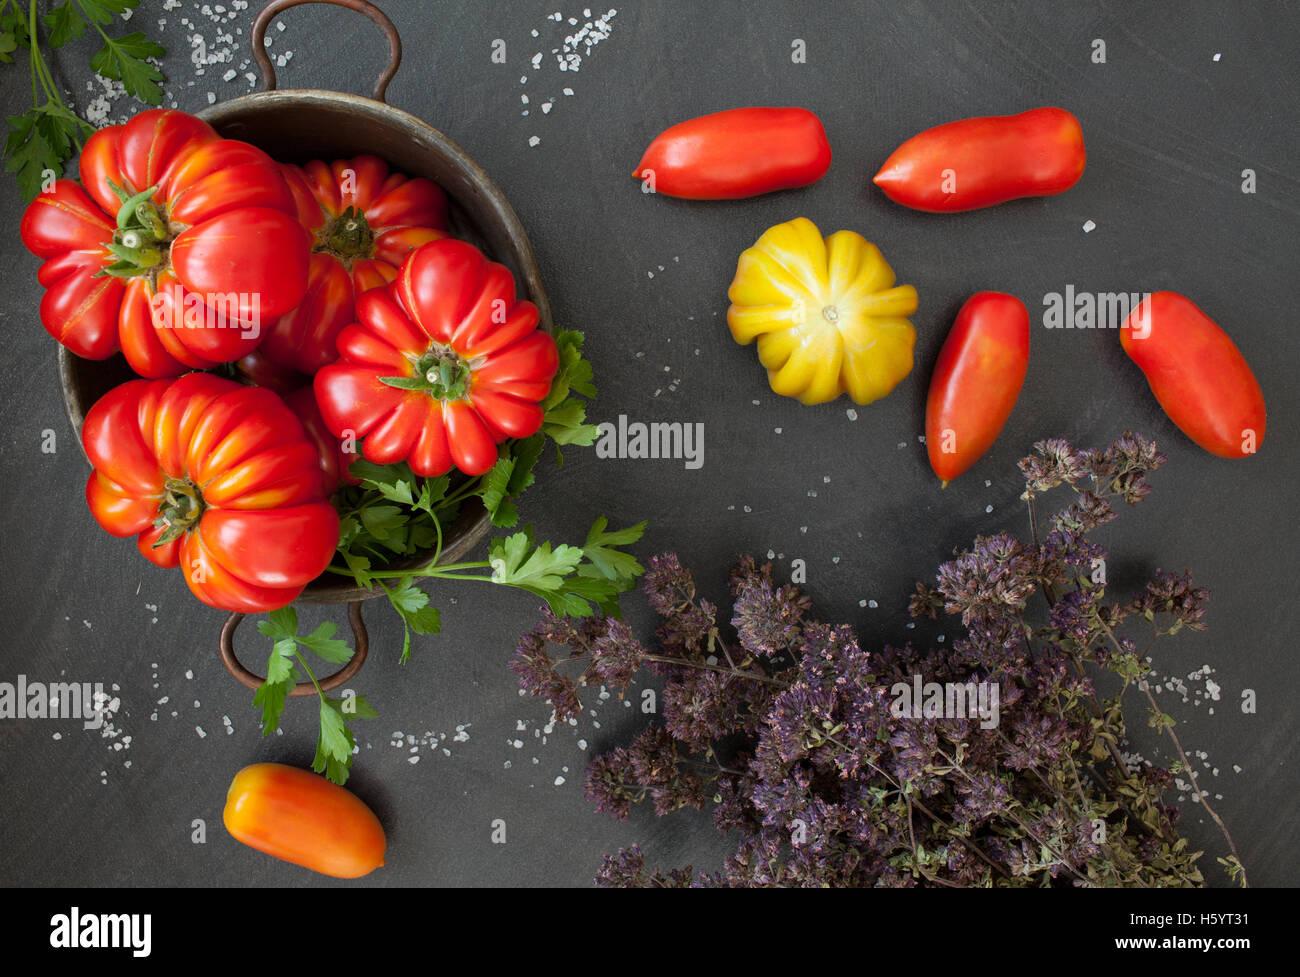 Tomaten und getrockneter Thymian Stockbild